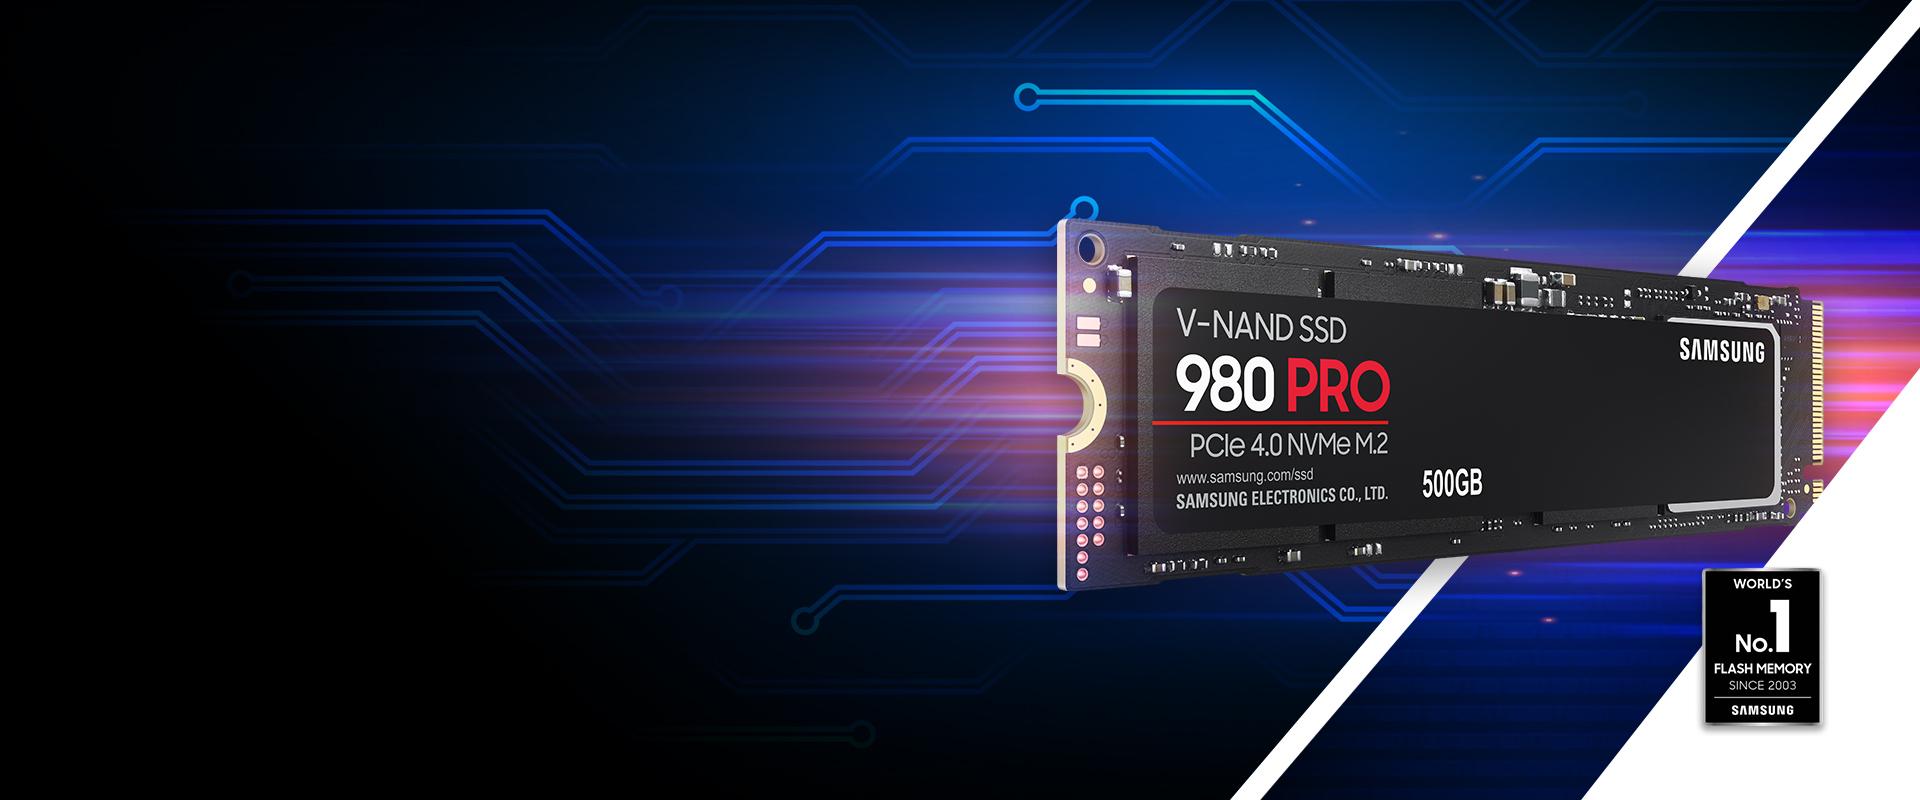 Samsun 980 PRO SSD